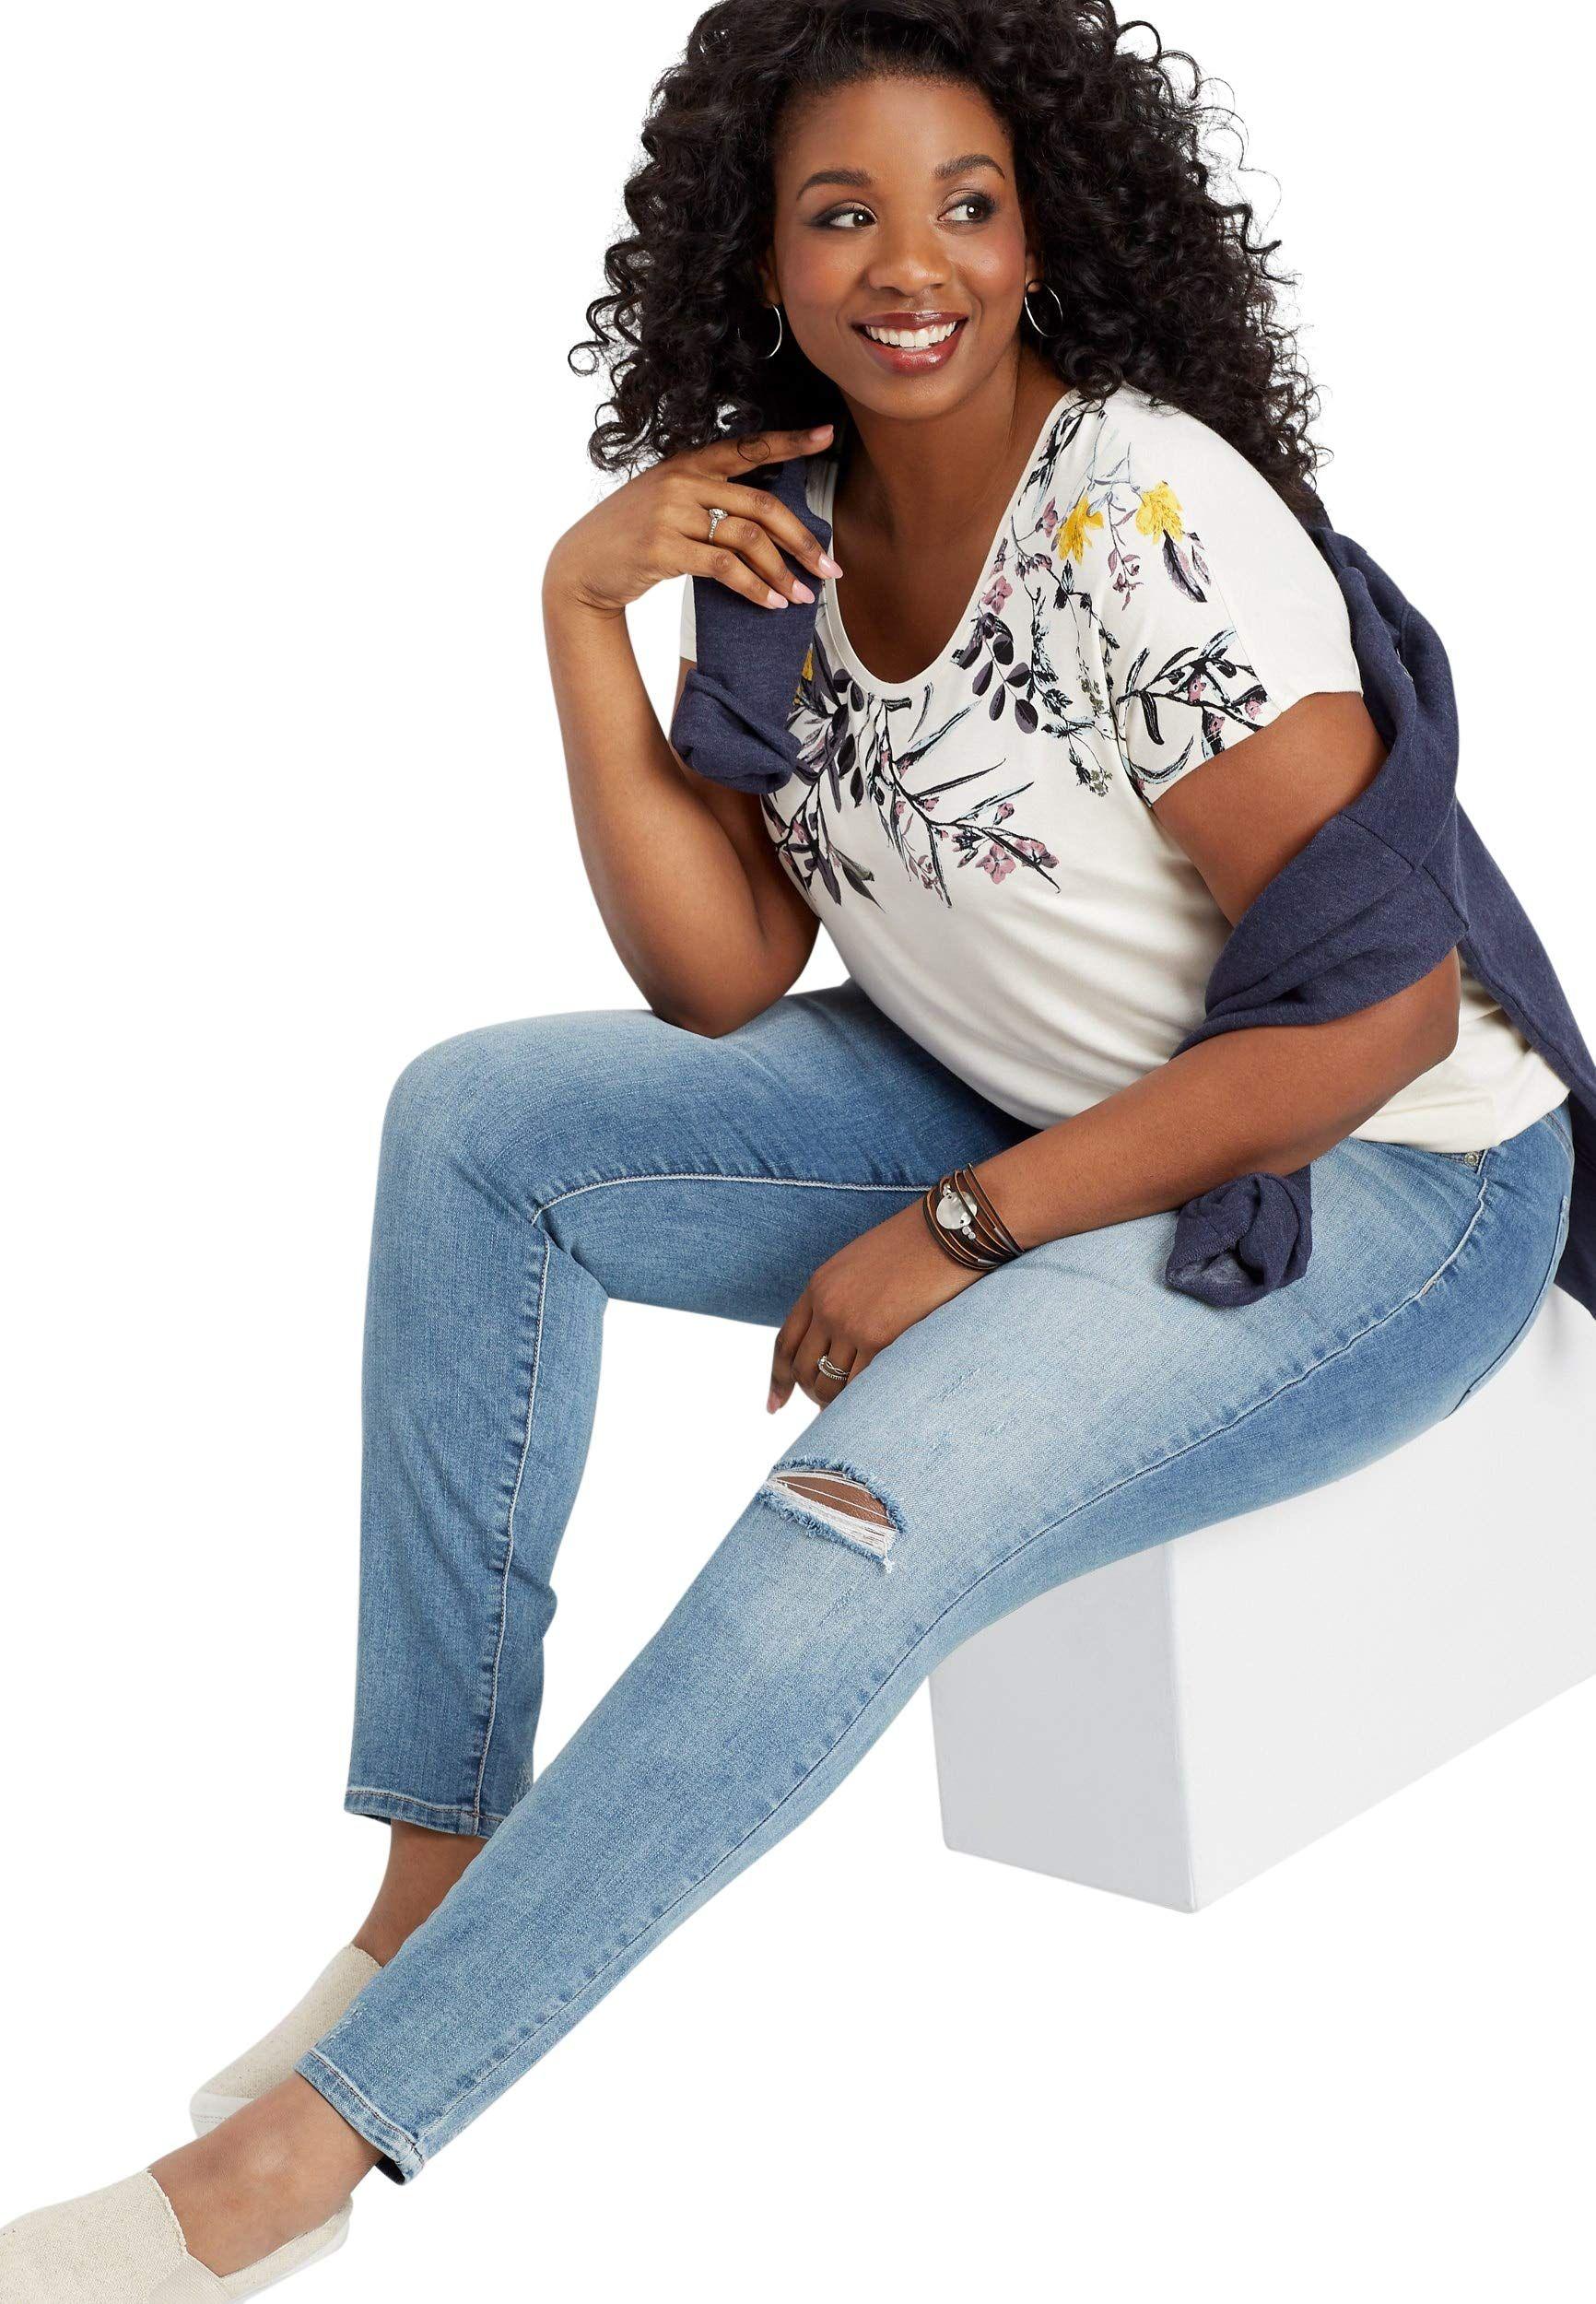 ce5618c4d39 Fashion Bug Women's Plus Size Denimflex TM Light Wash Destructed Finished  Hem Jegging 22 Light Sandblast www.fashionbug.us #fashionbug #plussize  #jeans